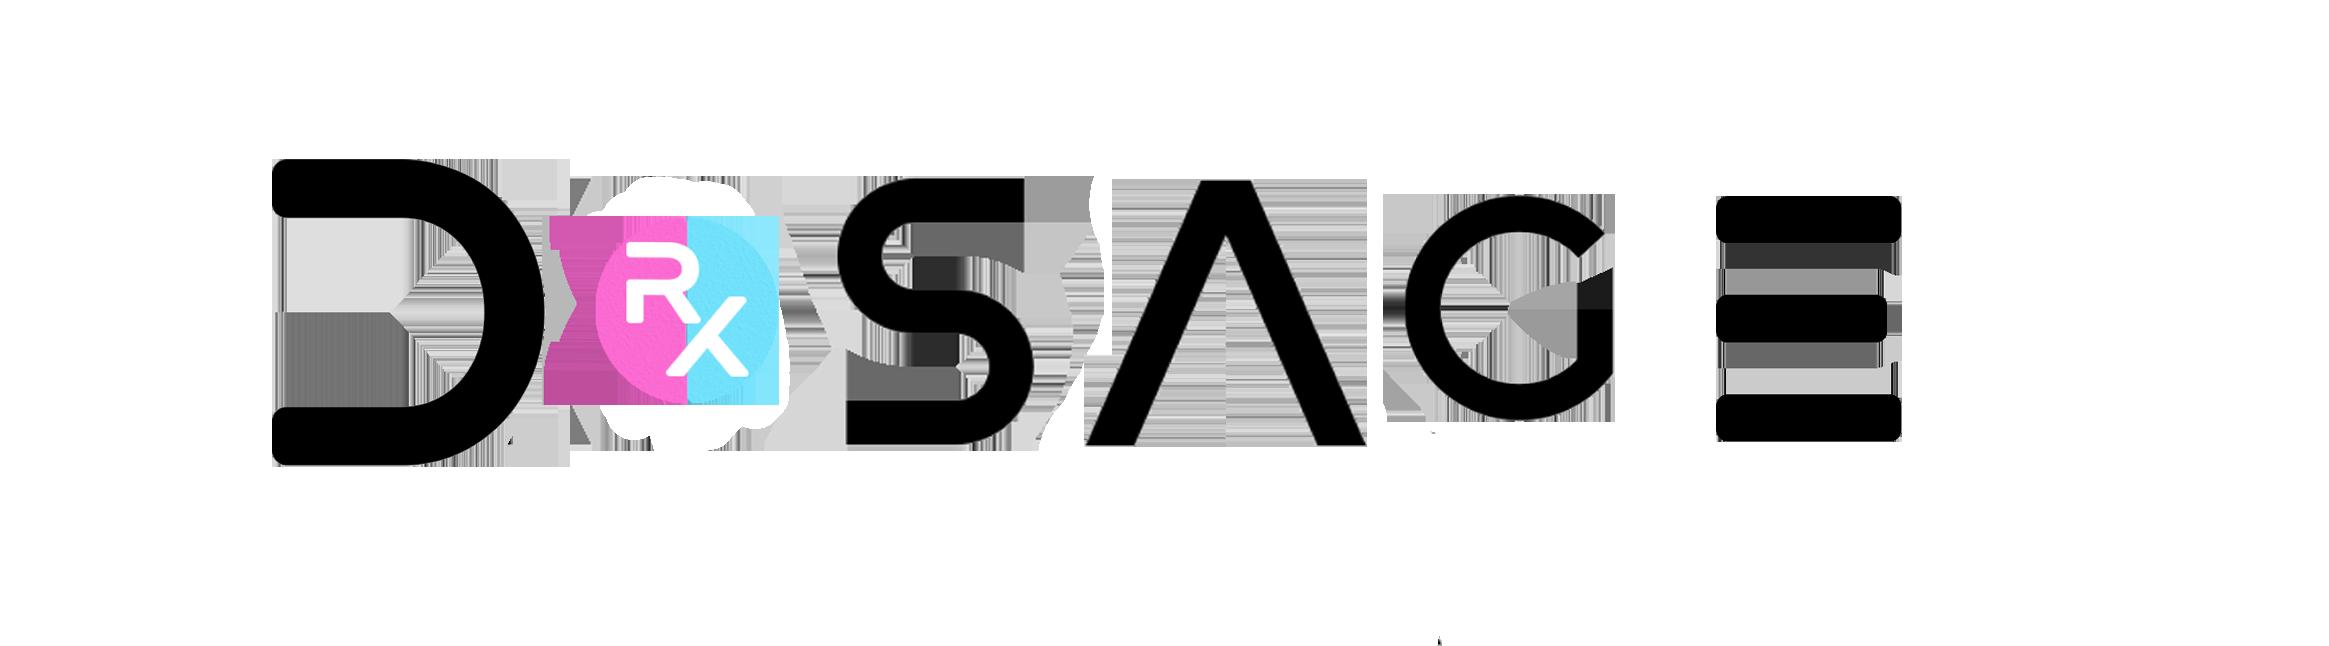 dosage rx logo